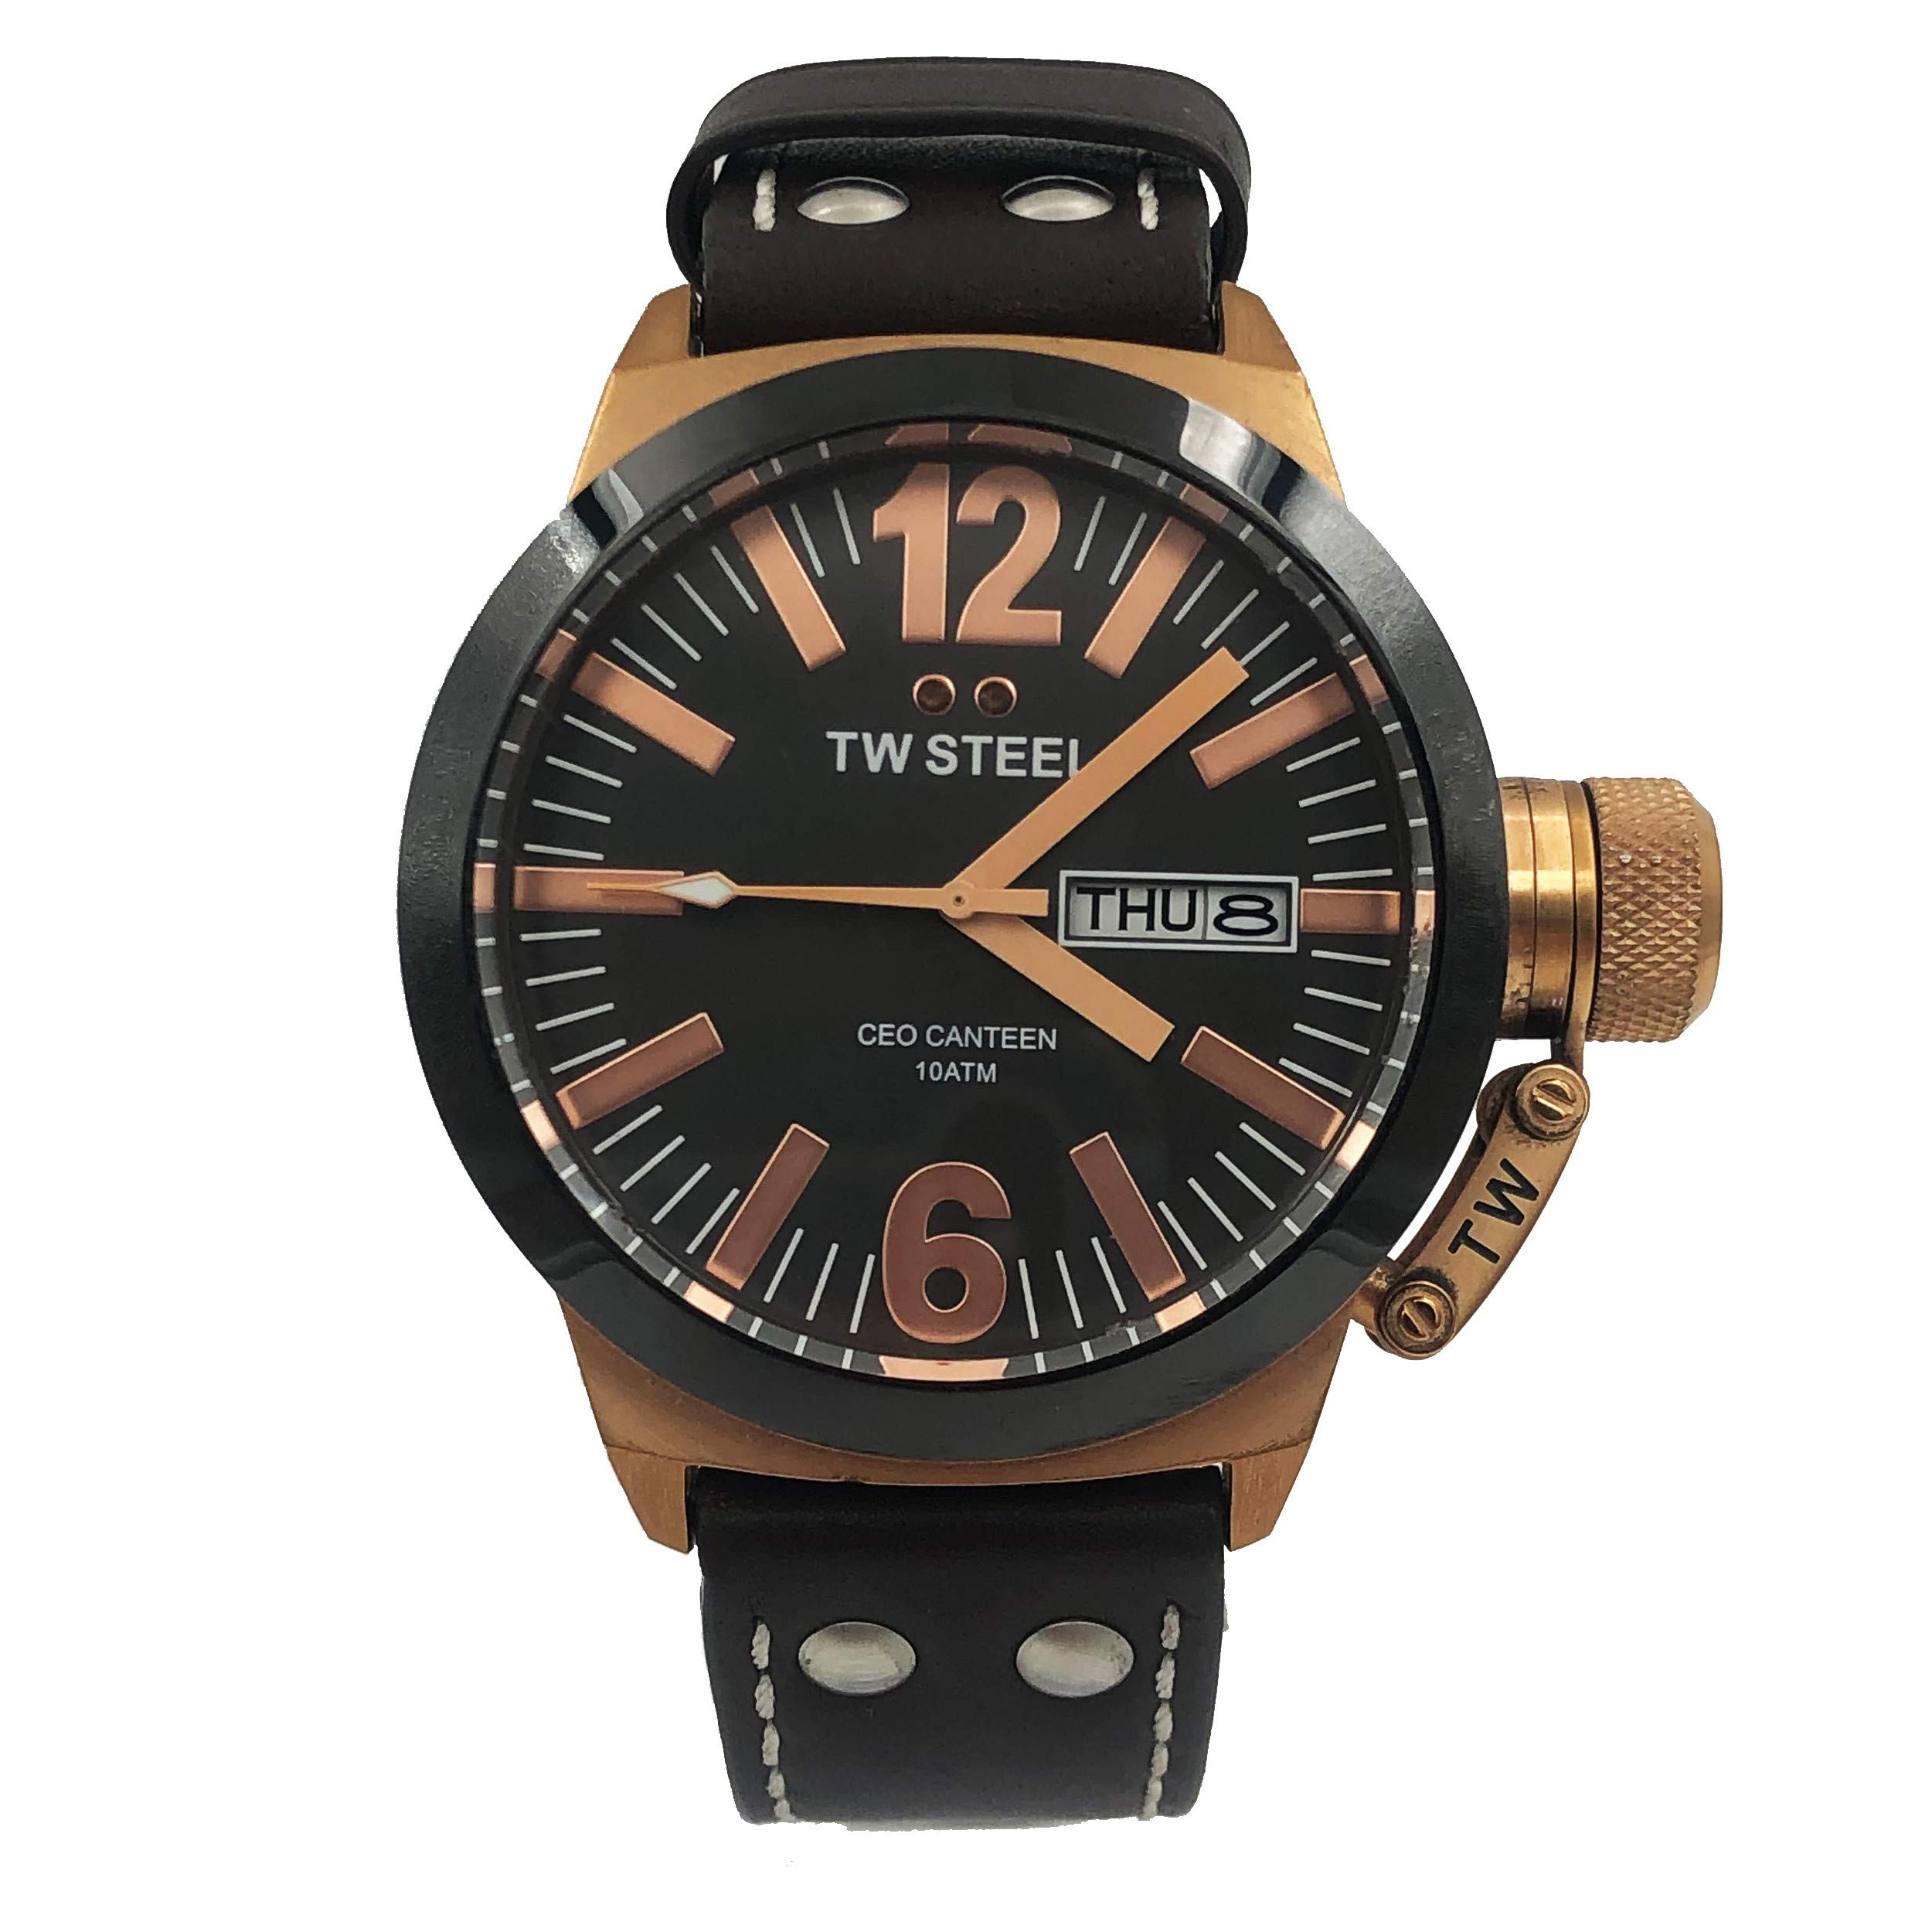 TW Steel Quartz Male Watch Canteen (Certified Pre-Owned) by TW Steel